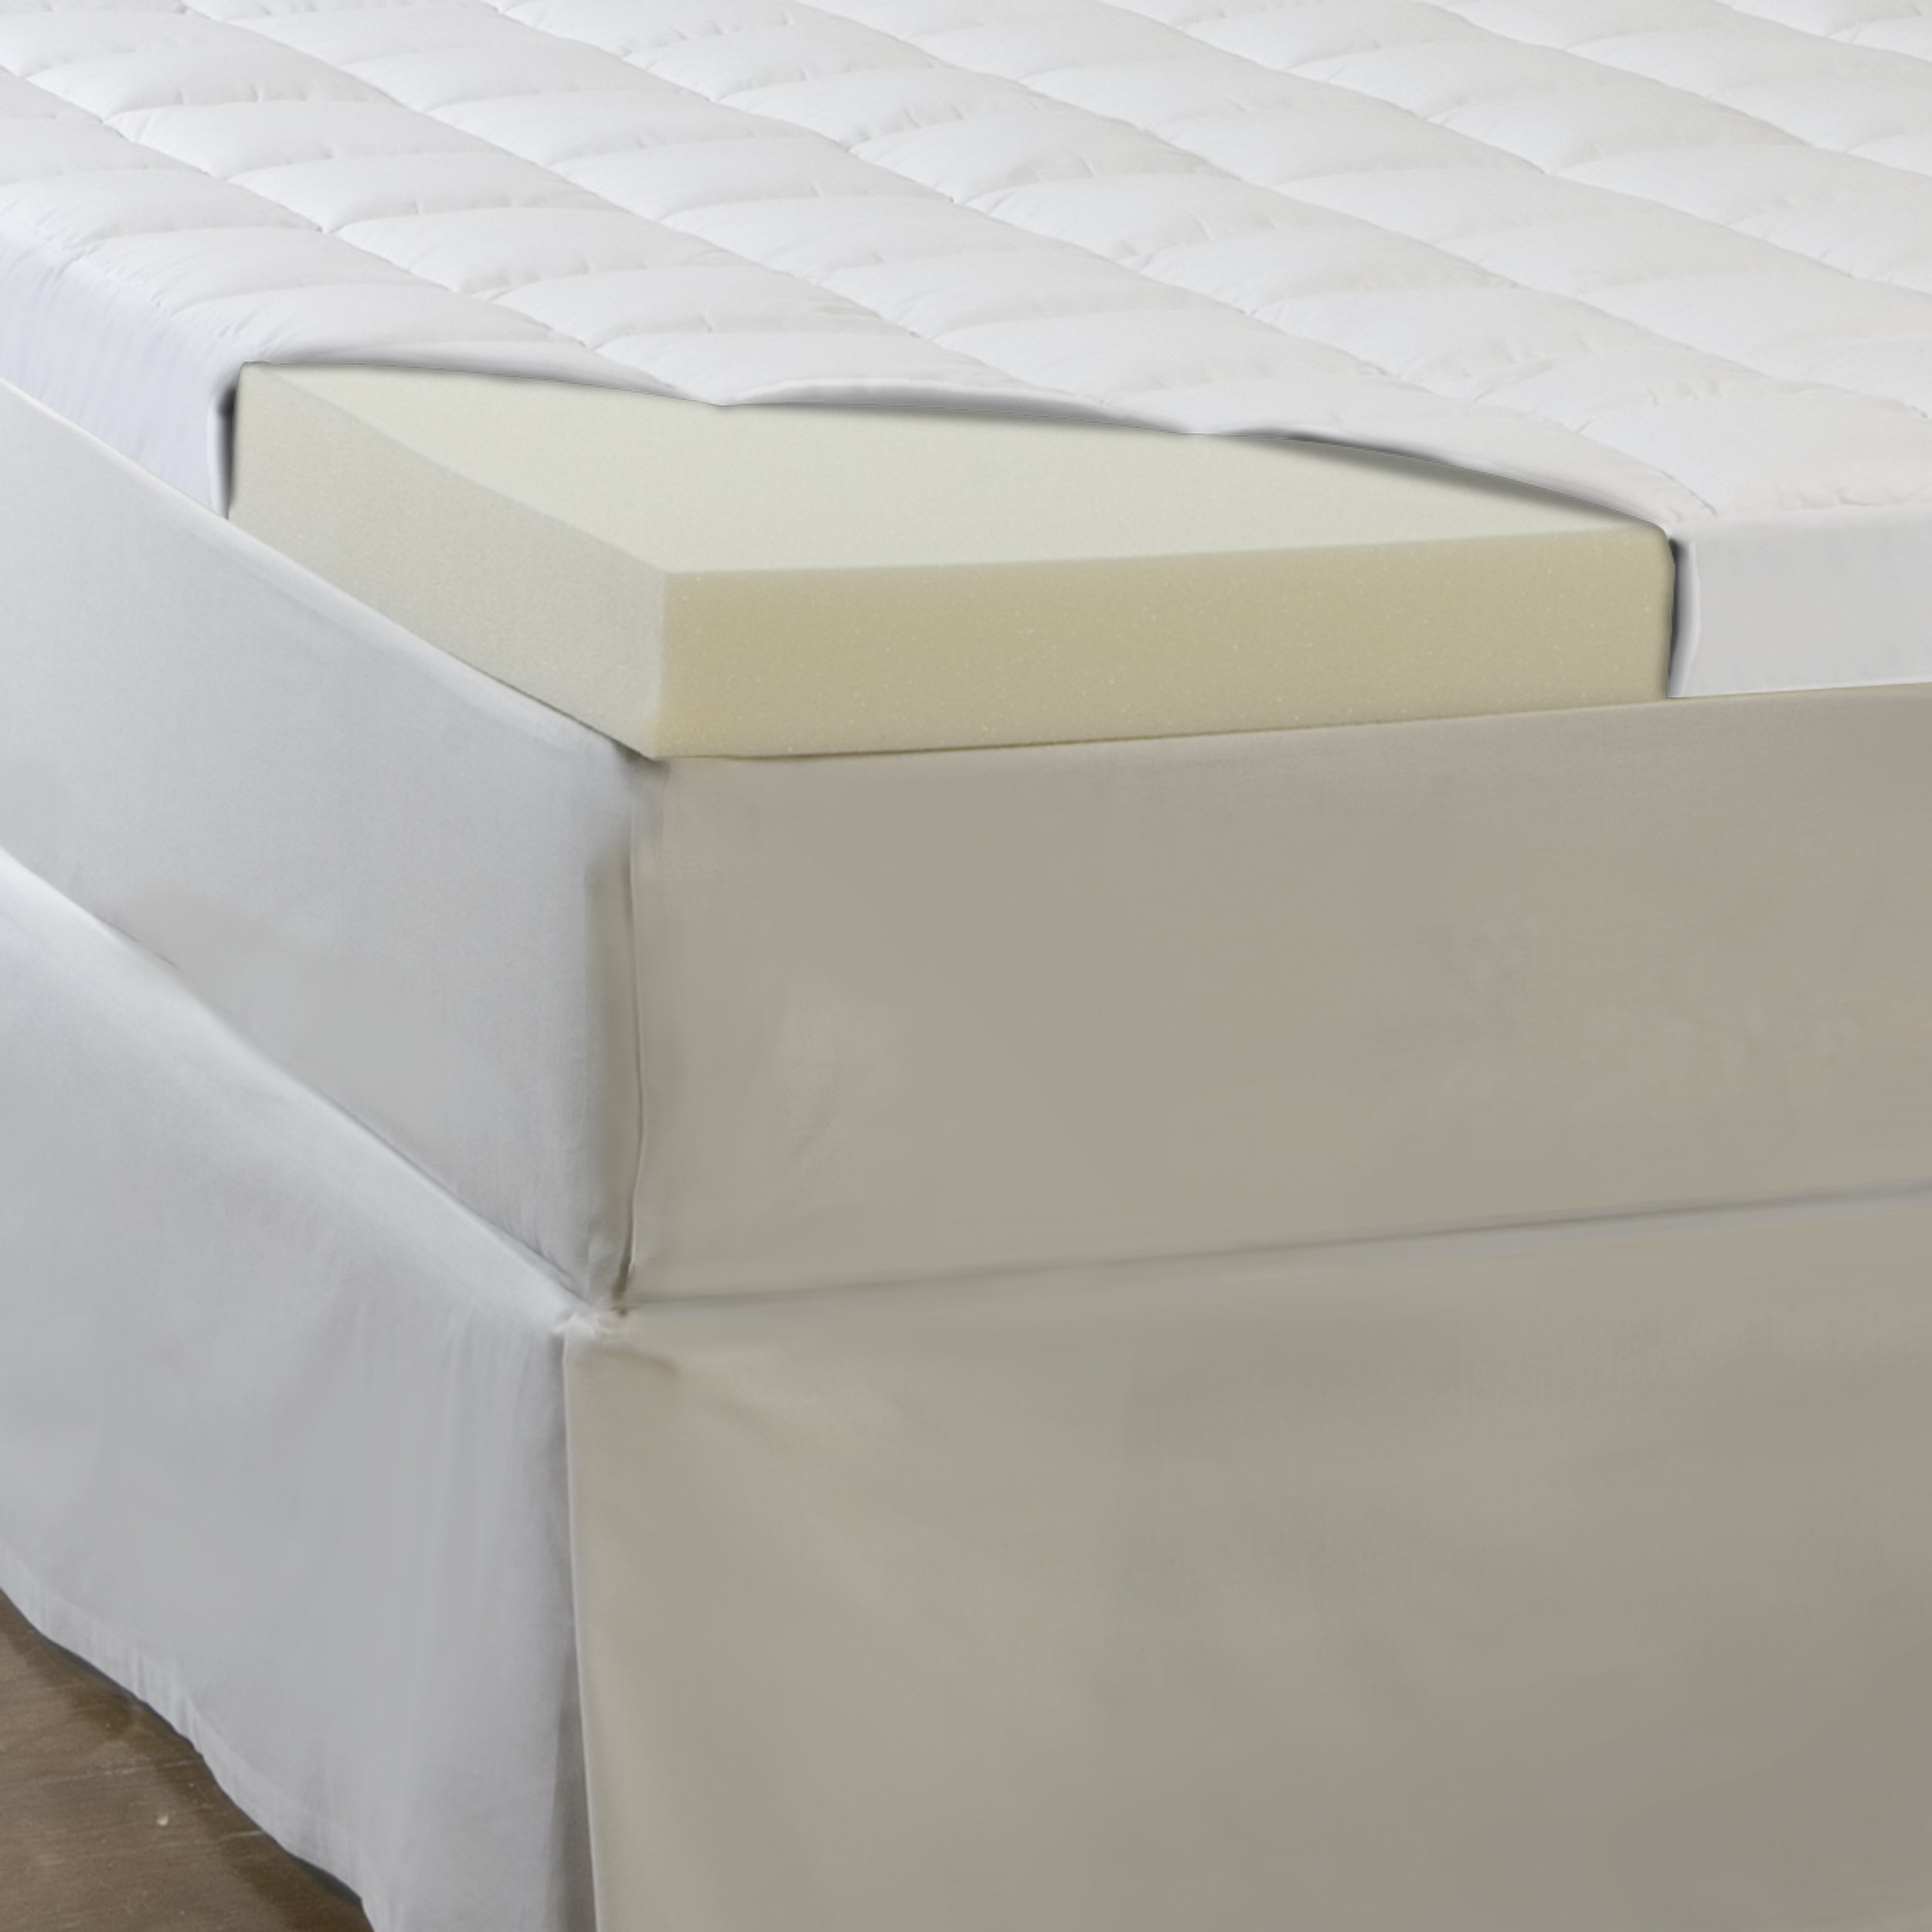 Hotel Comfort 5.5-Inch Memory Foam and Fiber Topper, Queen